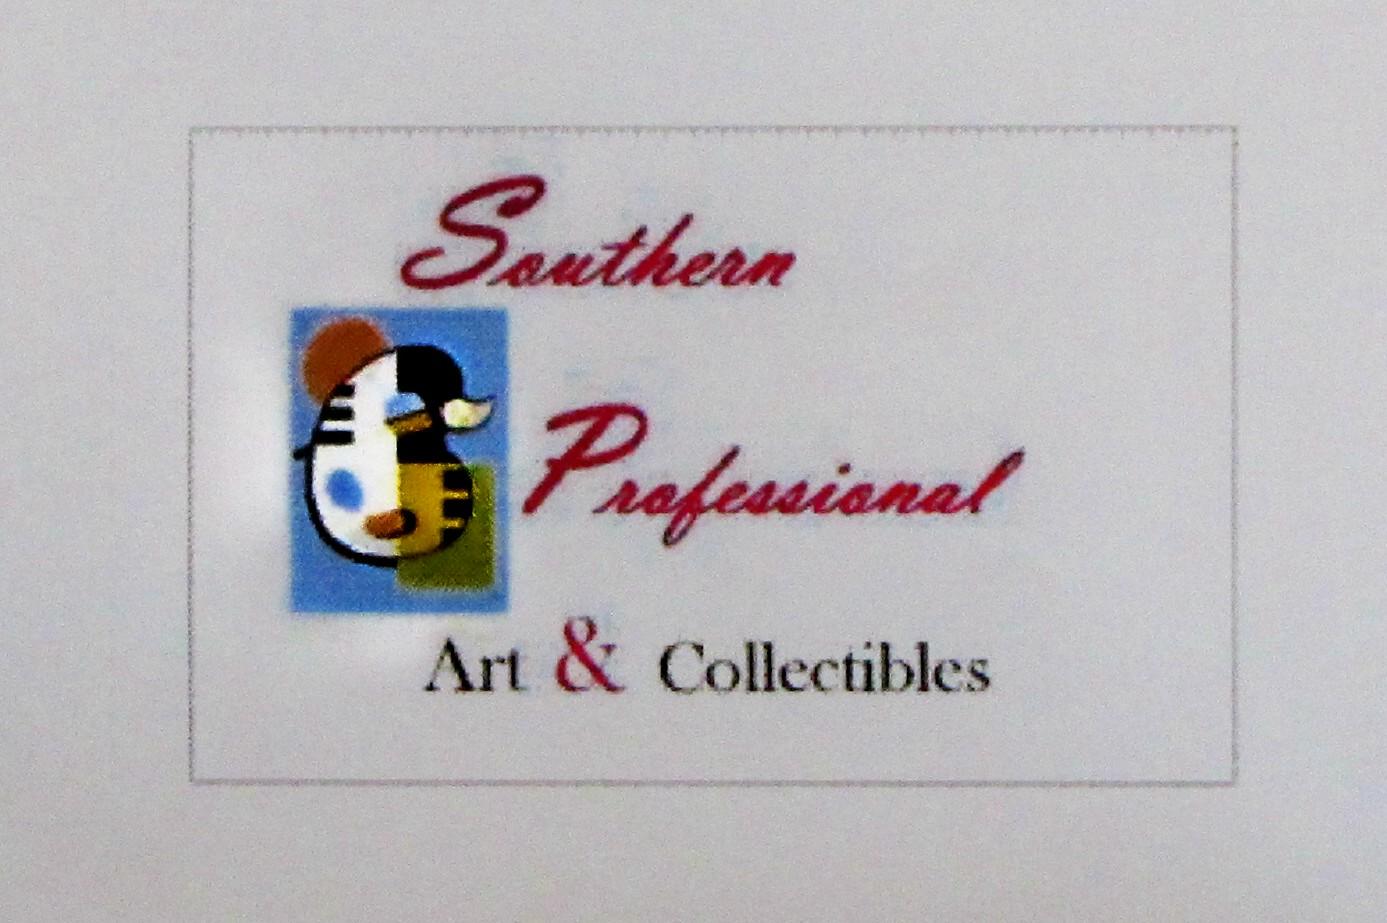 Southern Professional Art